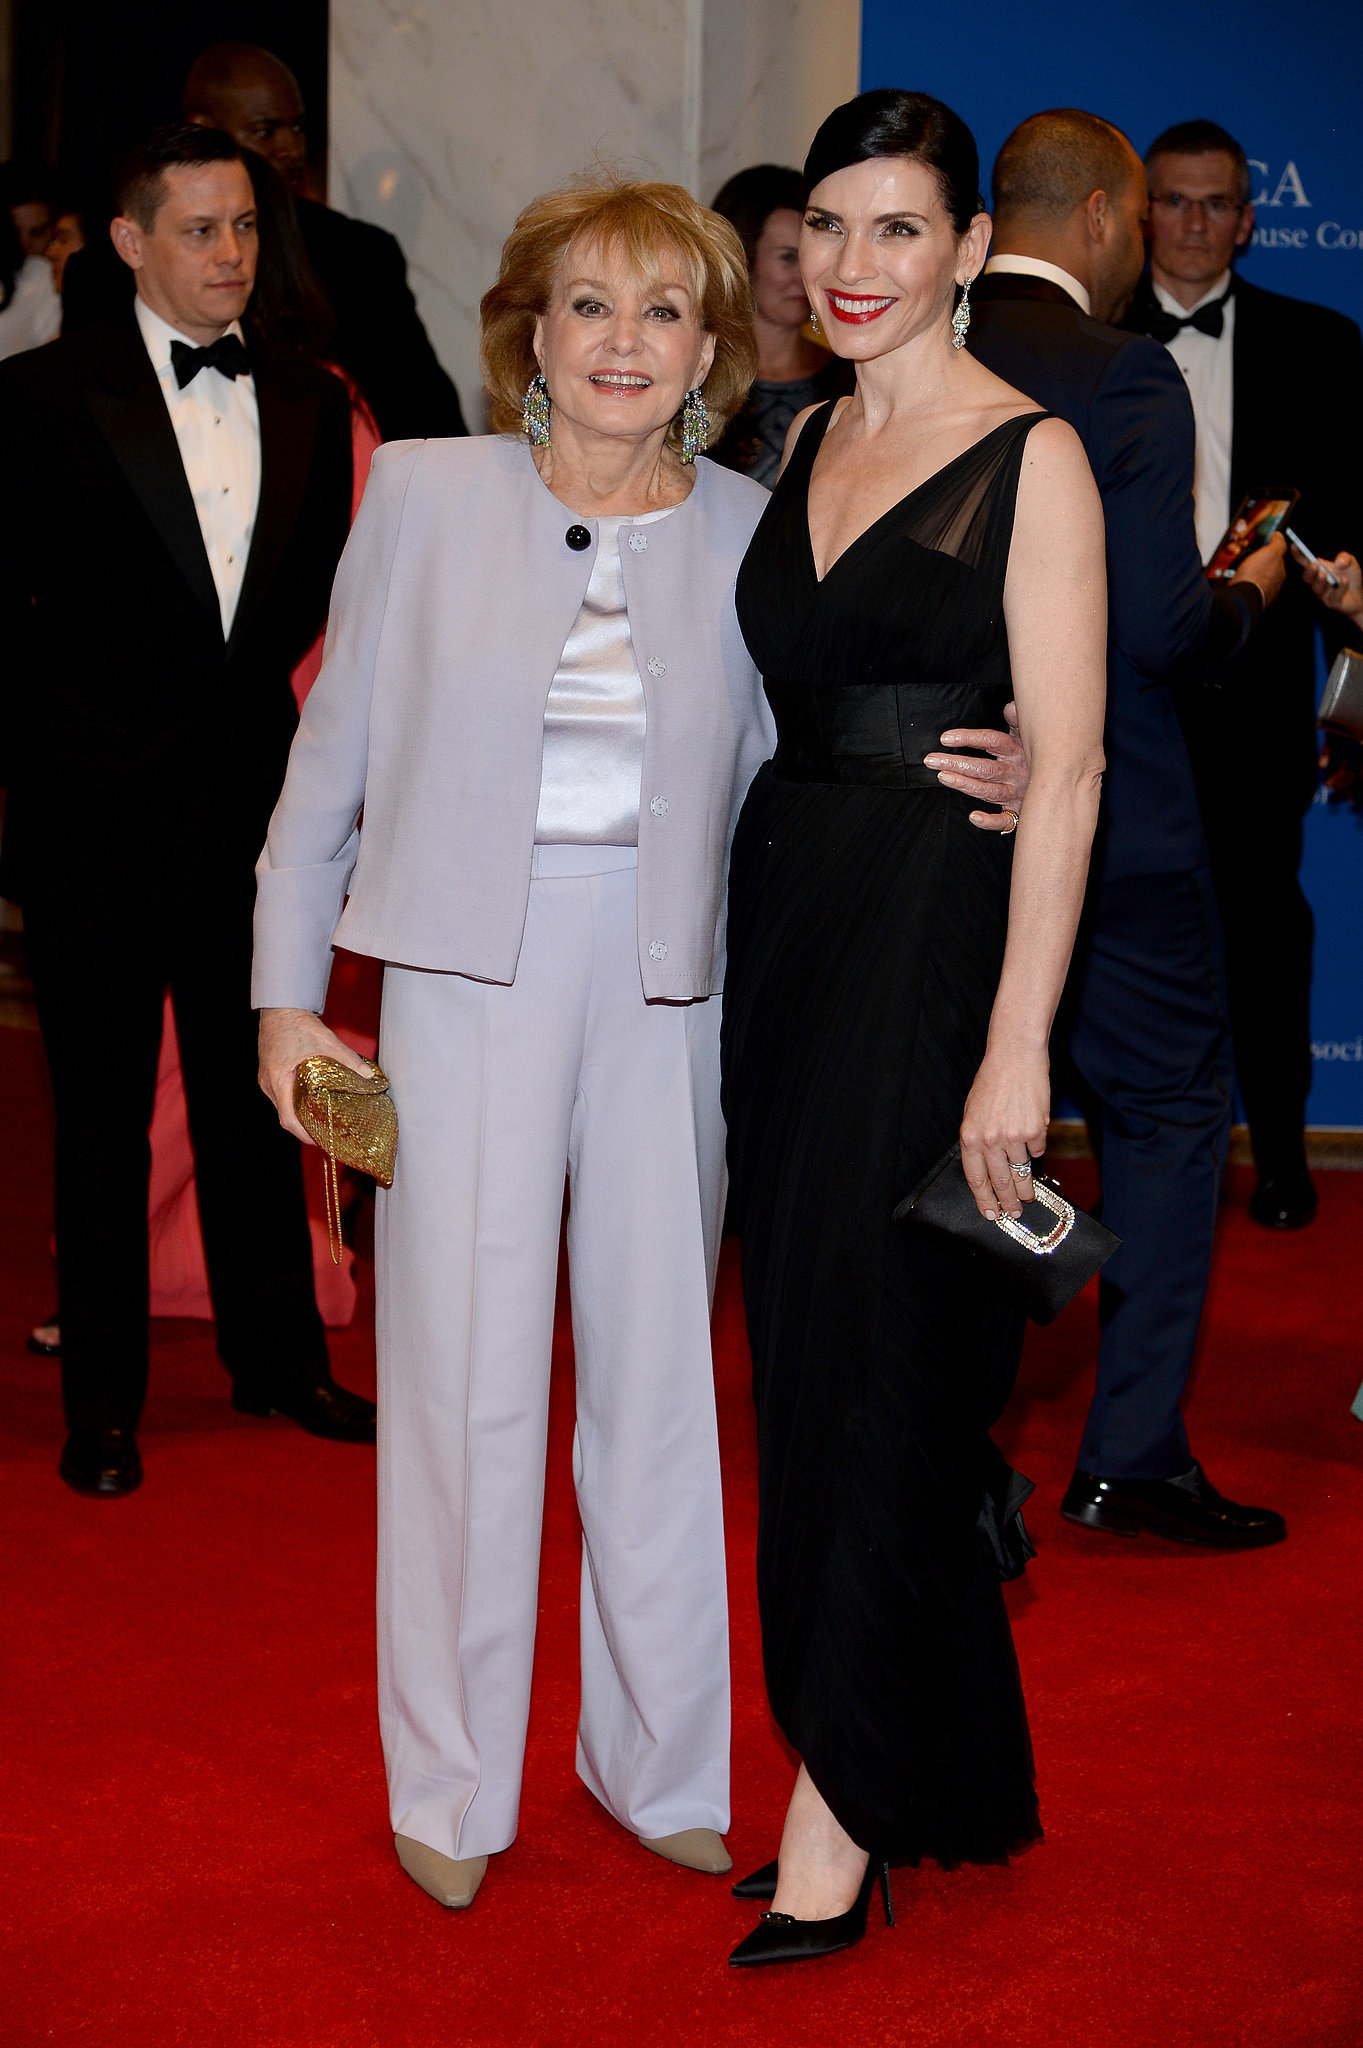 Barbara Walters buddied up with Julianna Margulies.